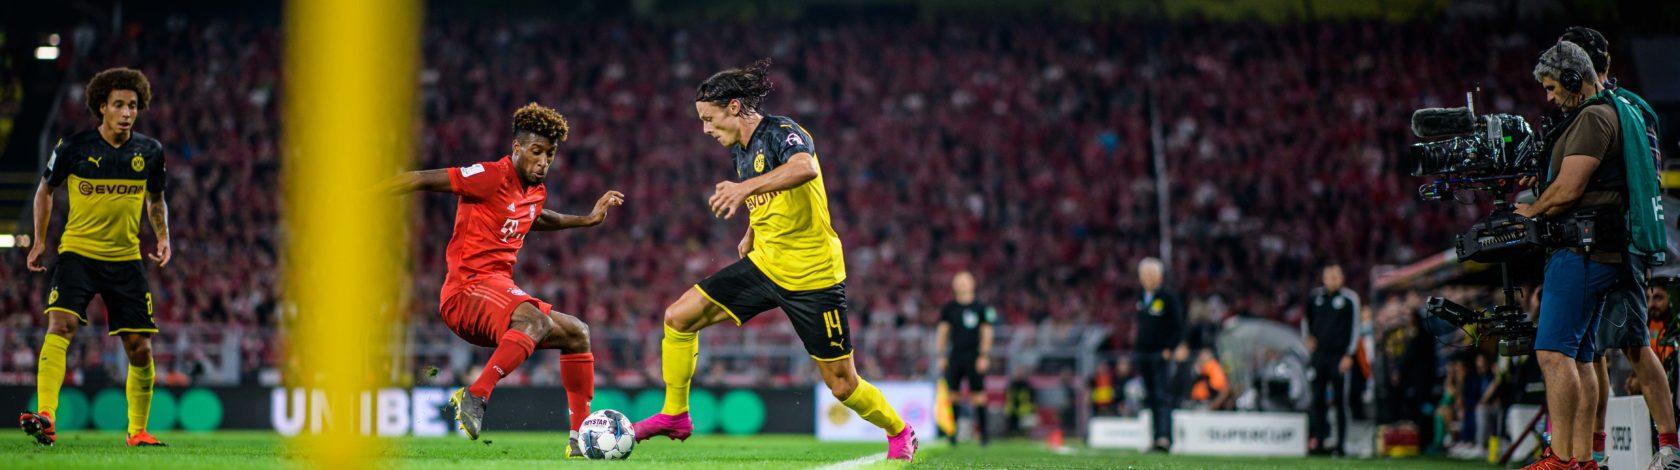 Borussia Dortmund v Bayern München – DFL Supercup 2019